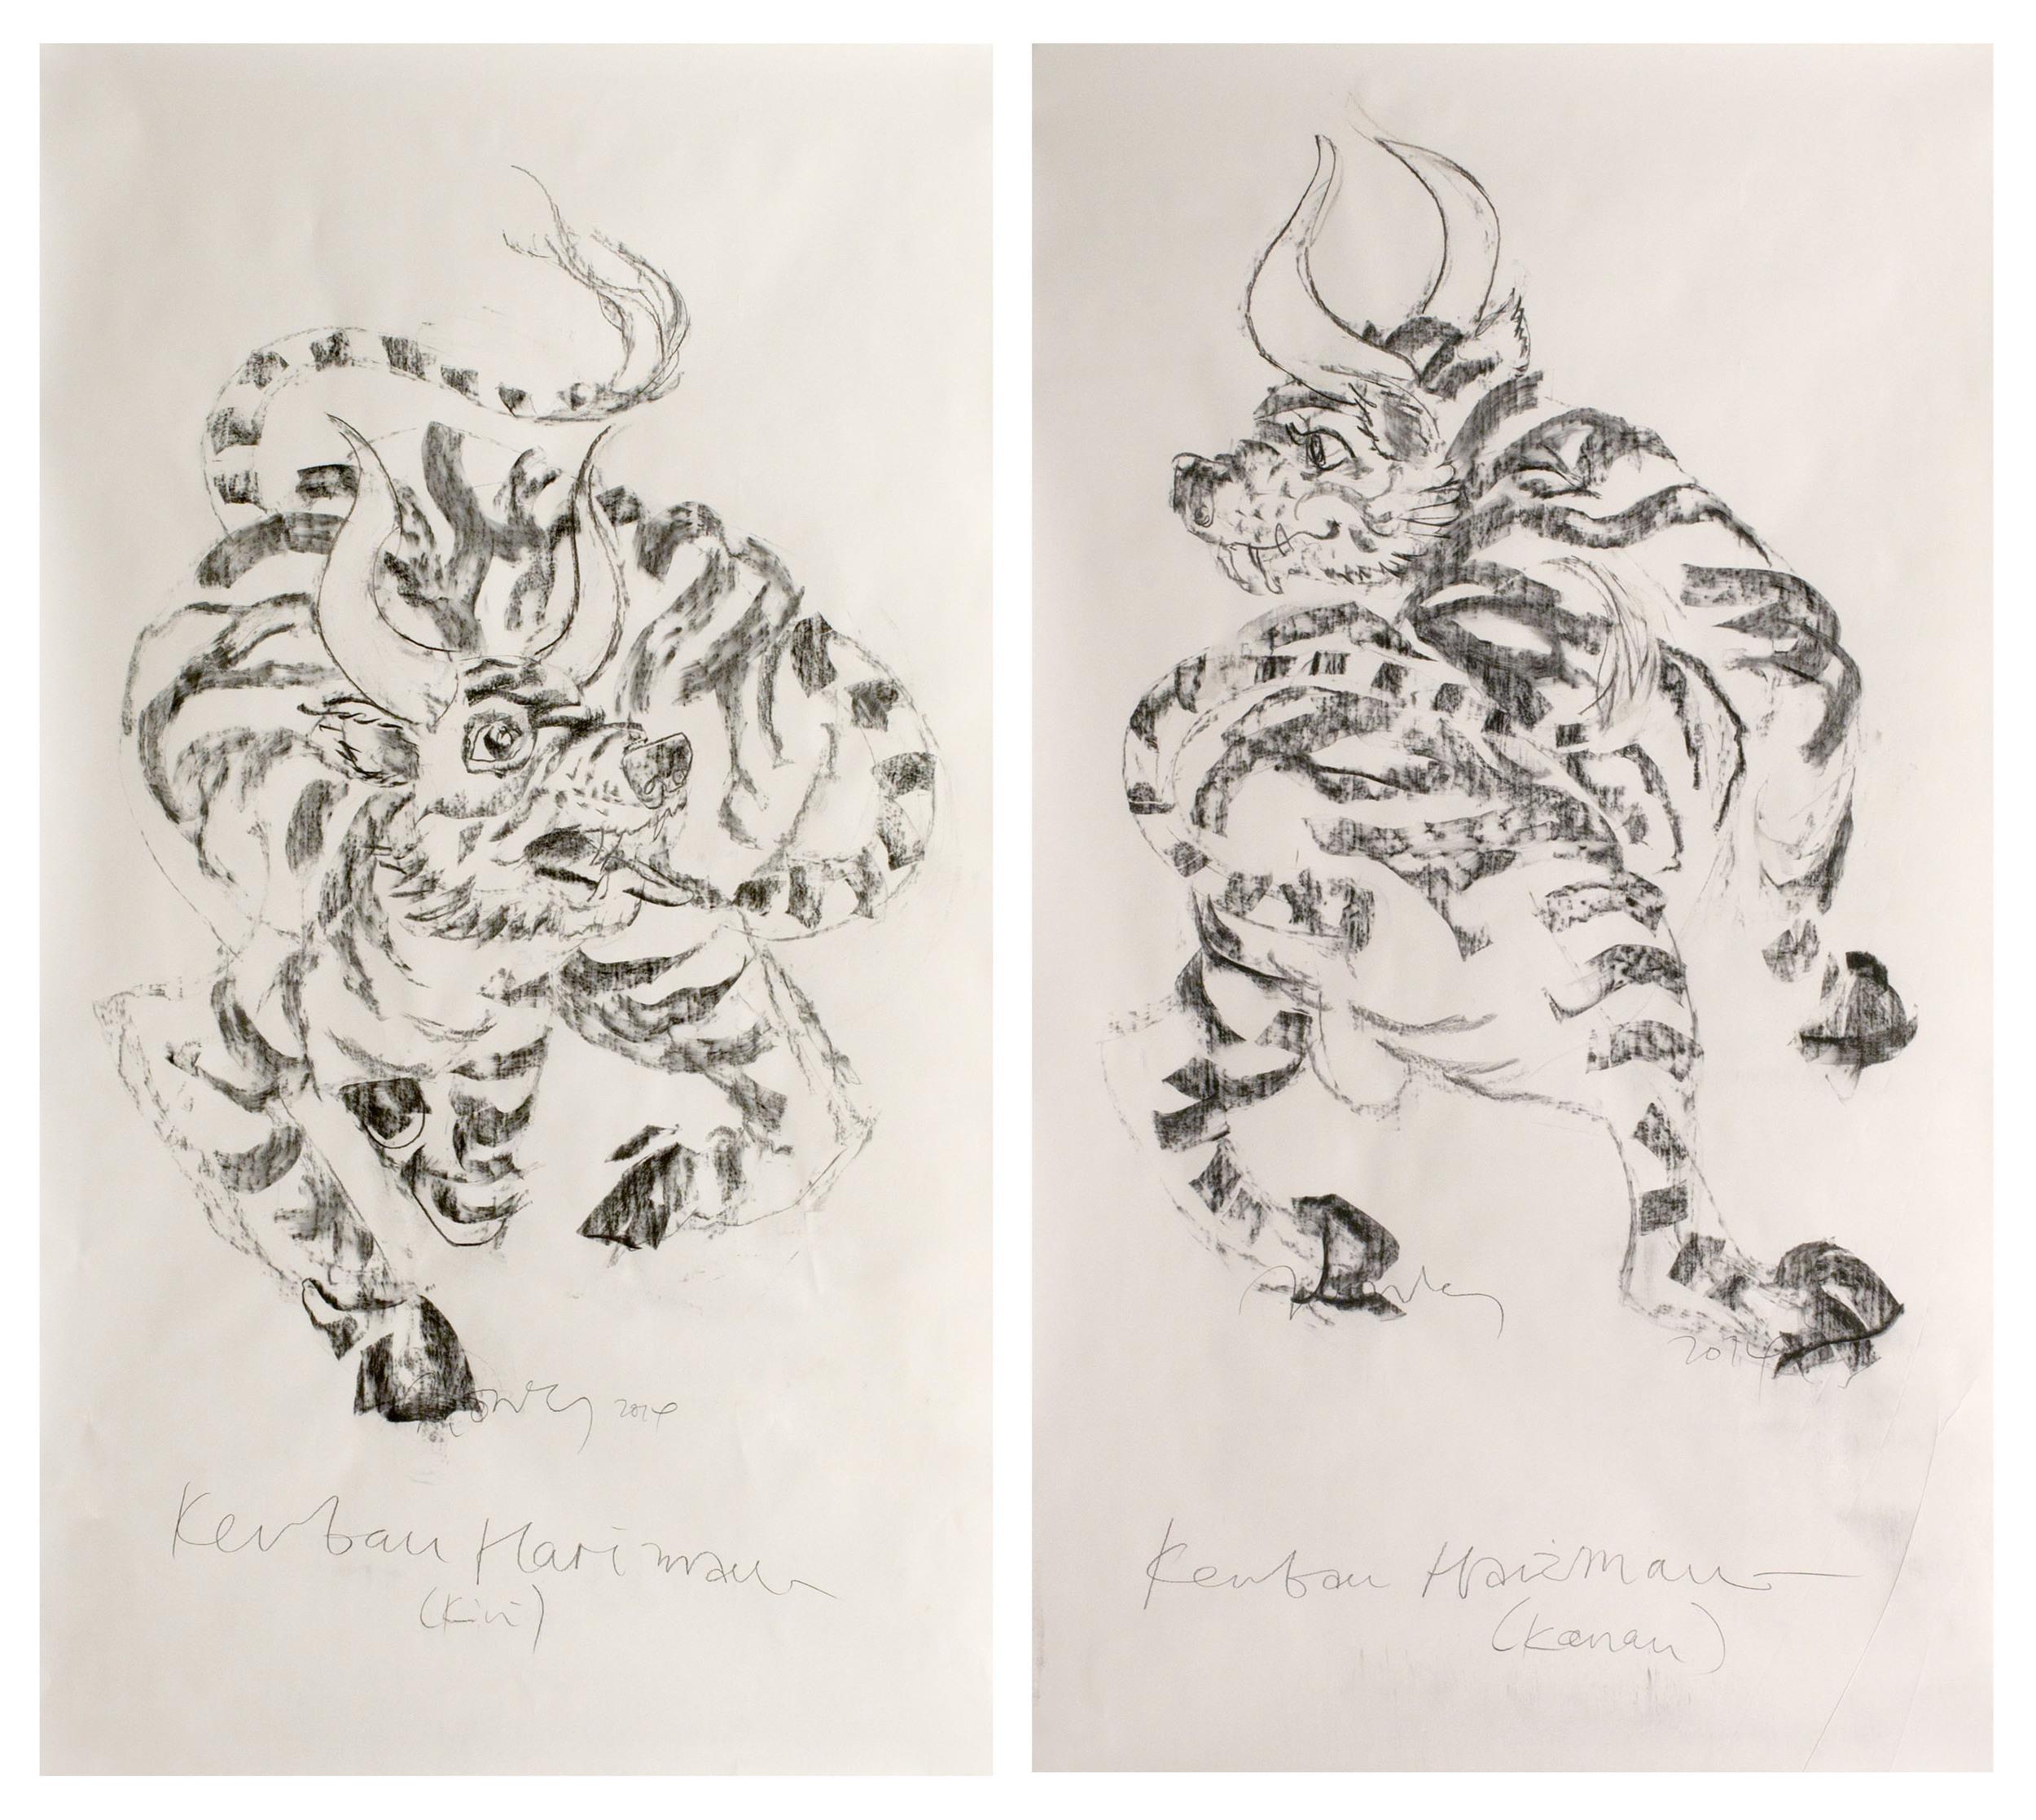 Kerbau Harimau Kiri  (Left)  Kerbau Harimau Kanan (Right) 2014 Charcoal on paper 175 x 101 cm (each; paper)